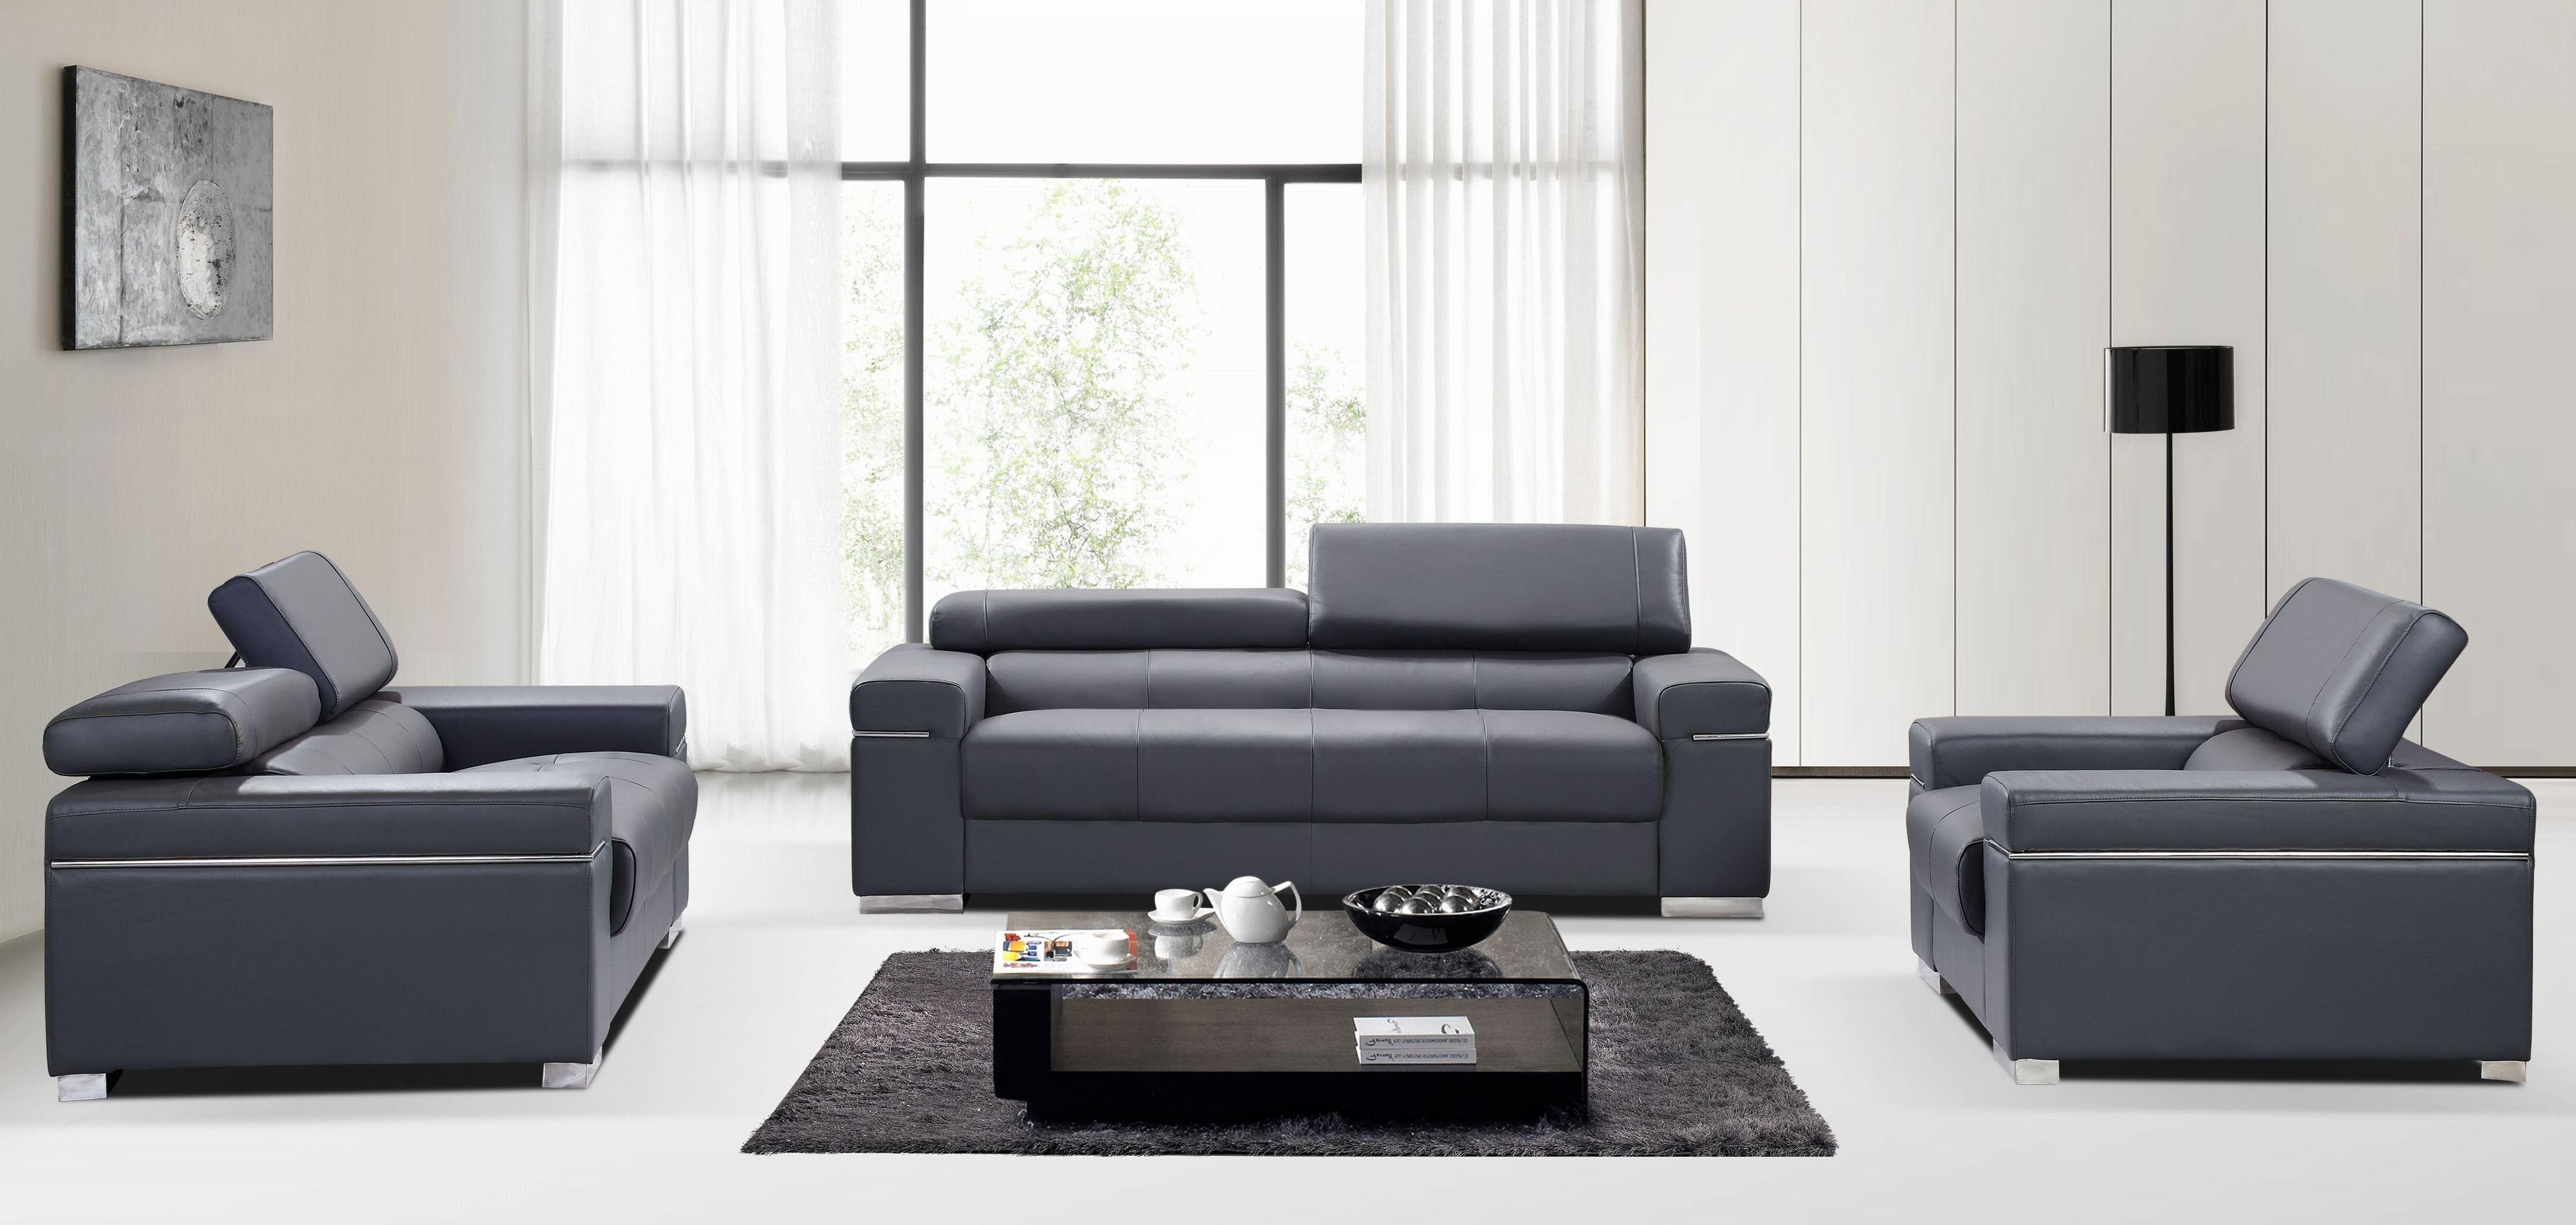 Soho Grey Leather Living Room Set From J M 176551113 S Gr Coleman Furniture